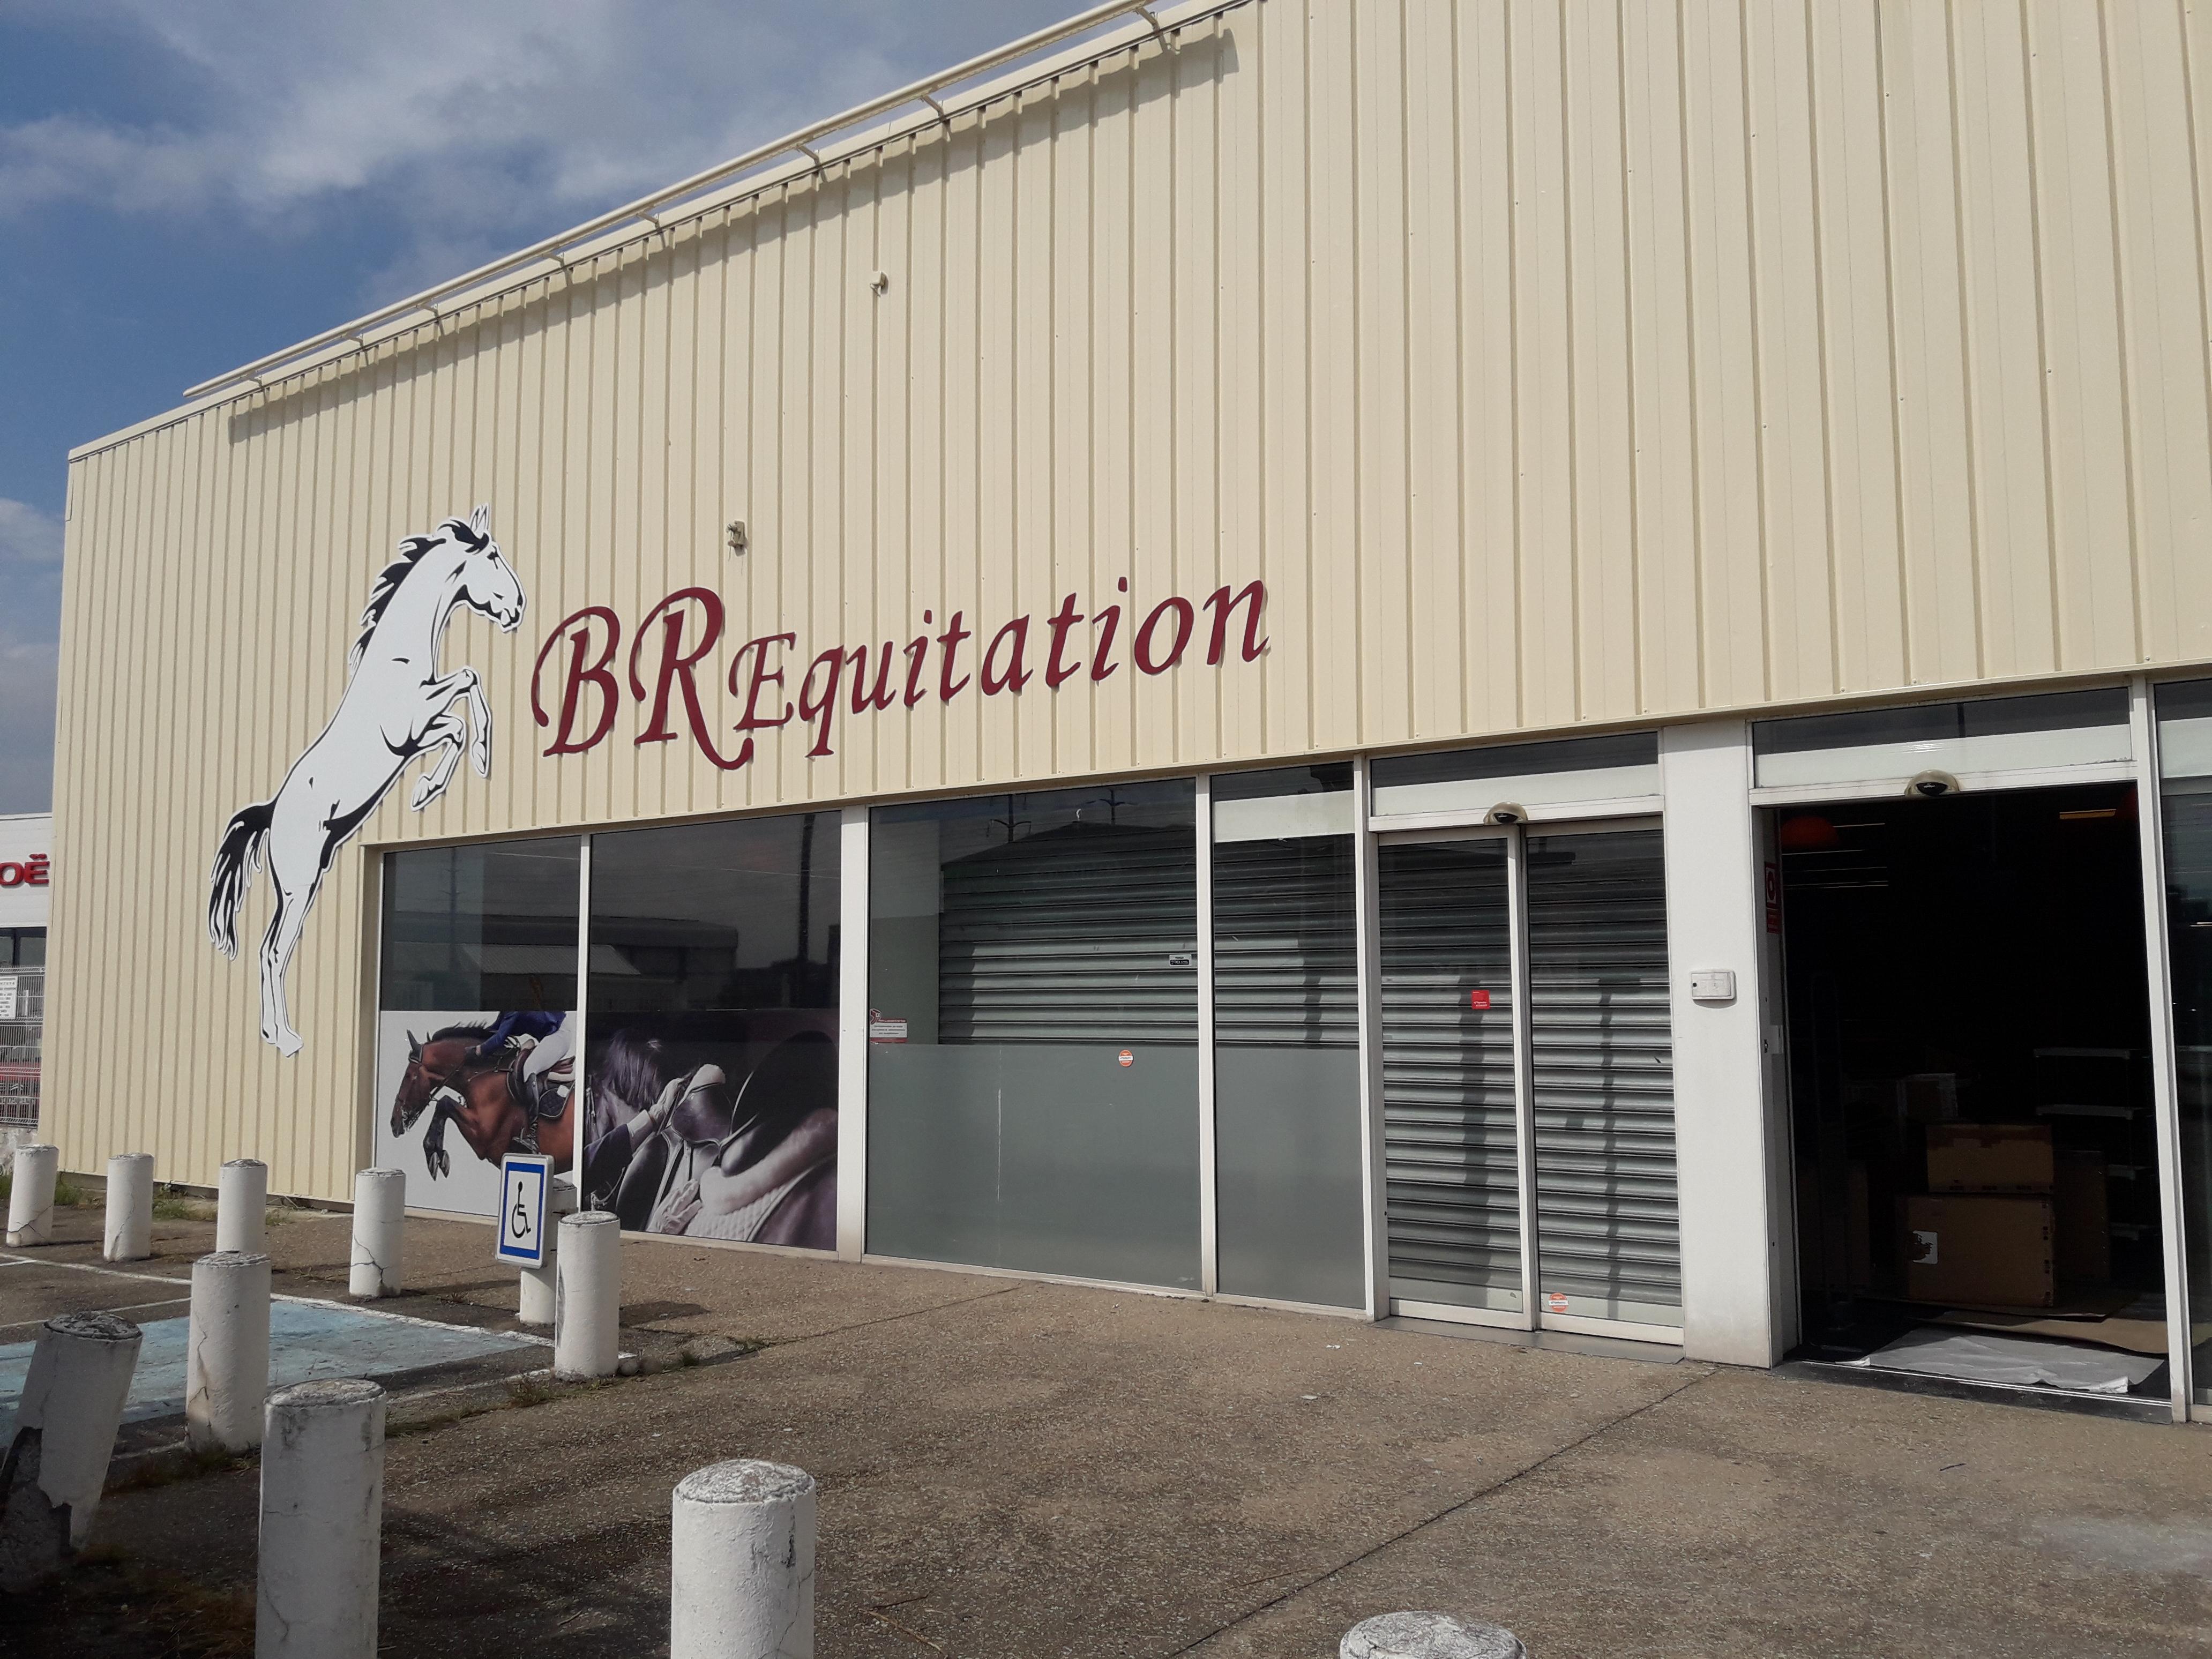 Enseigne BR Equitation - Sodifalux